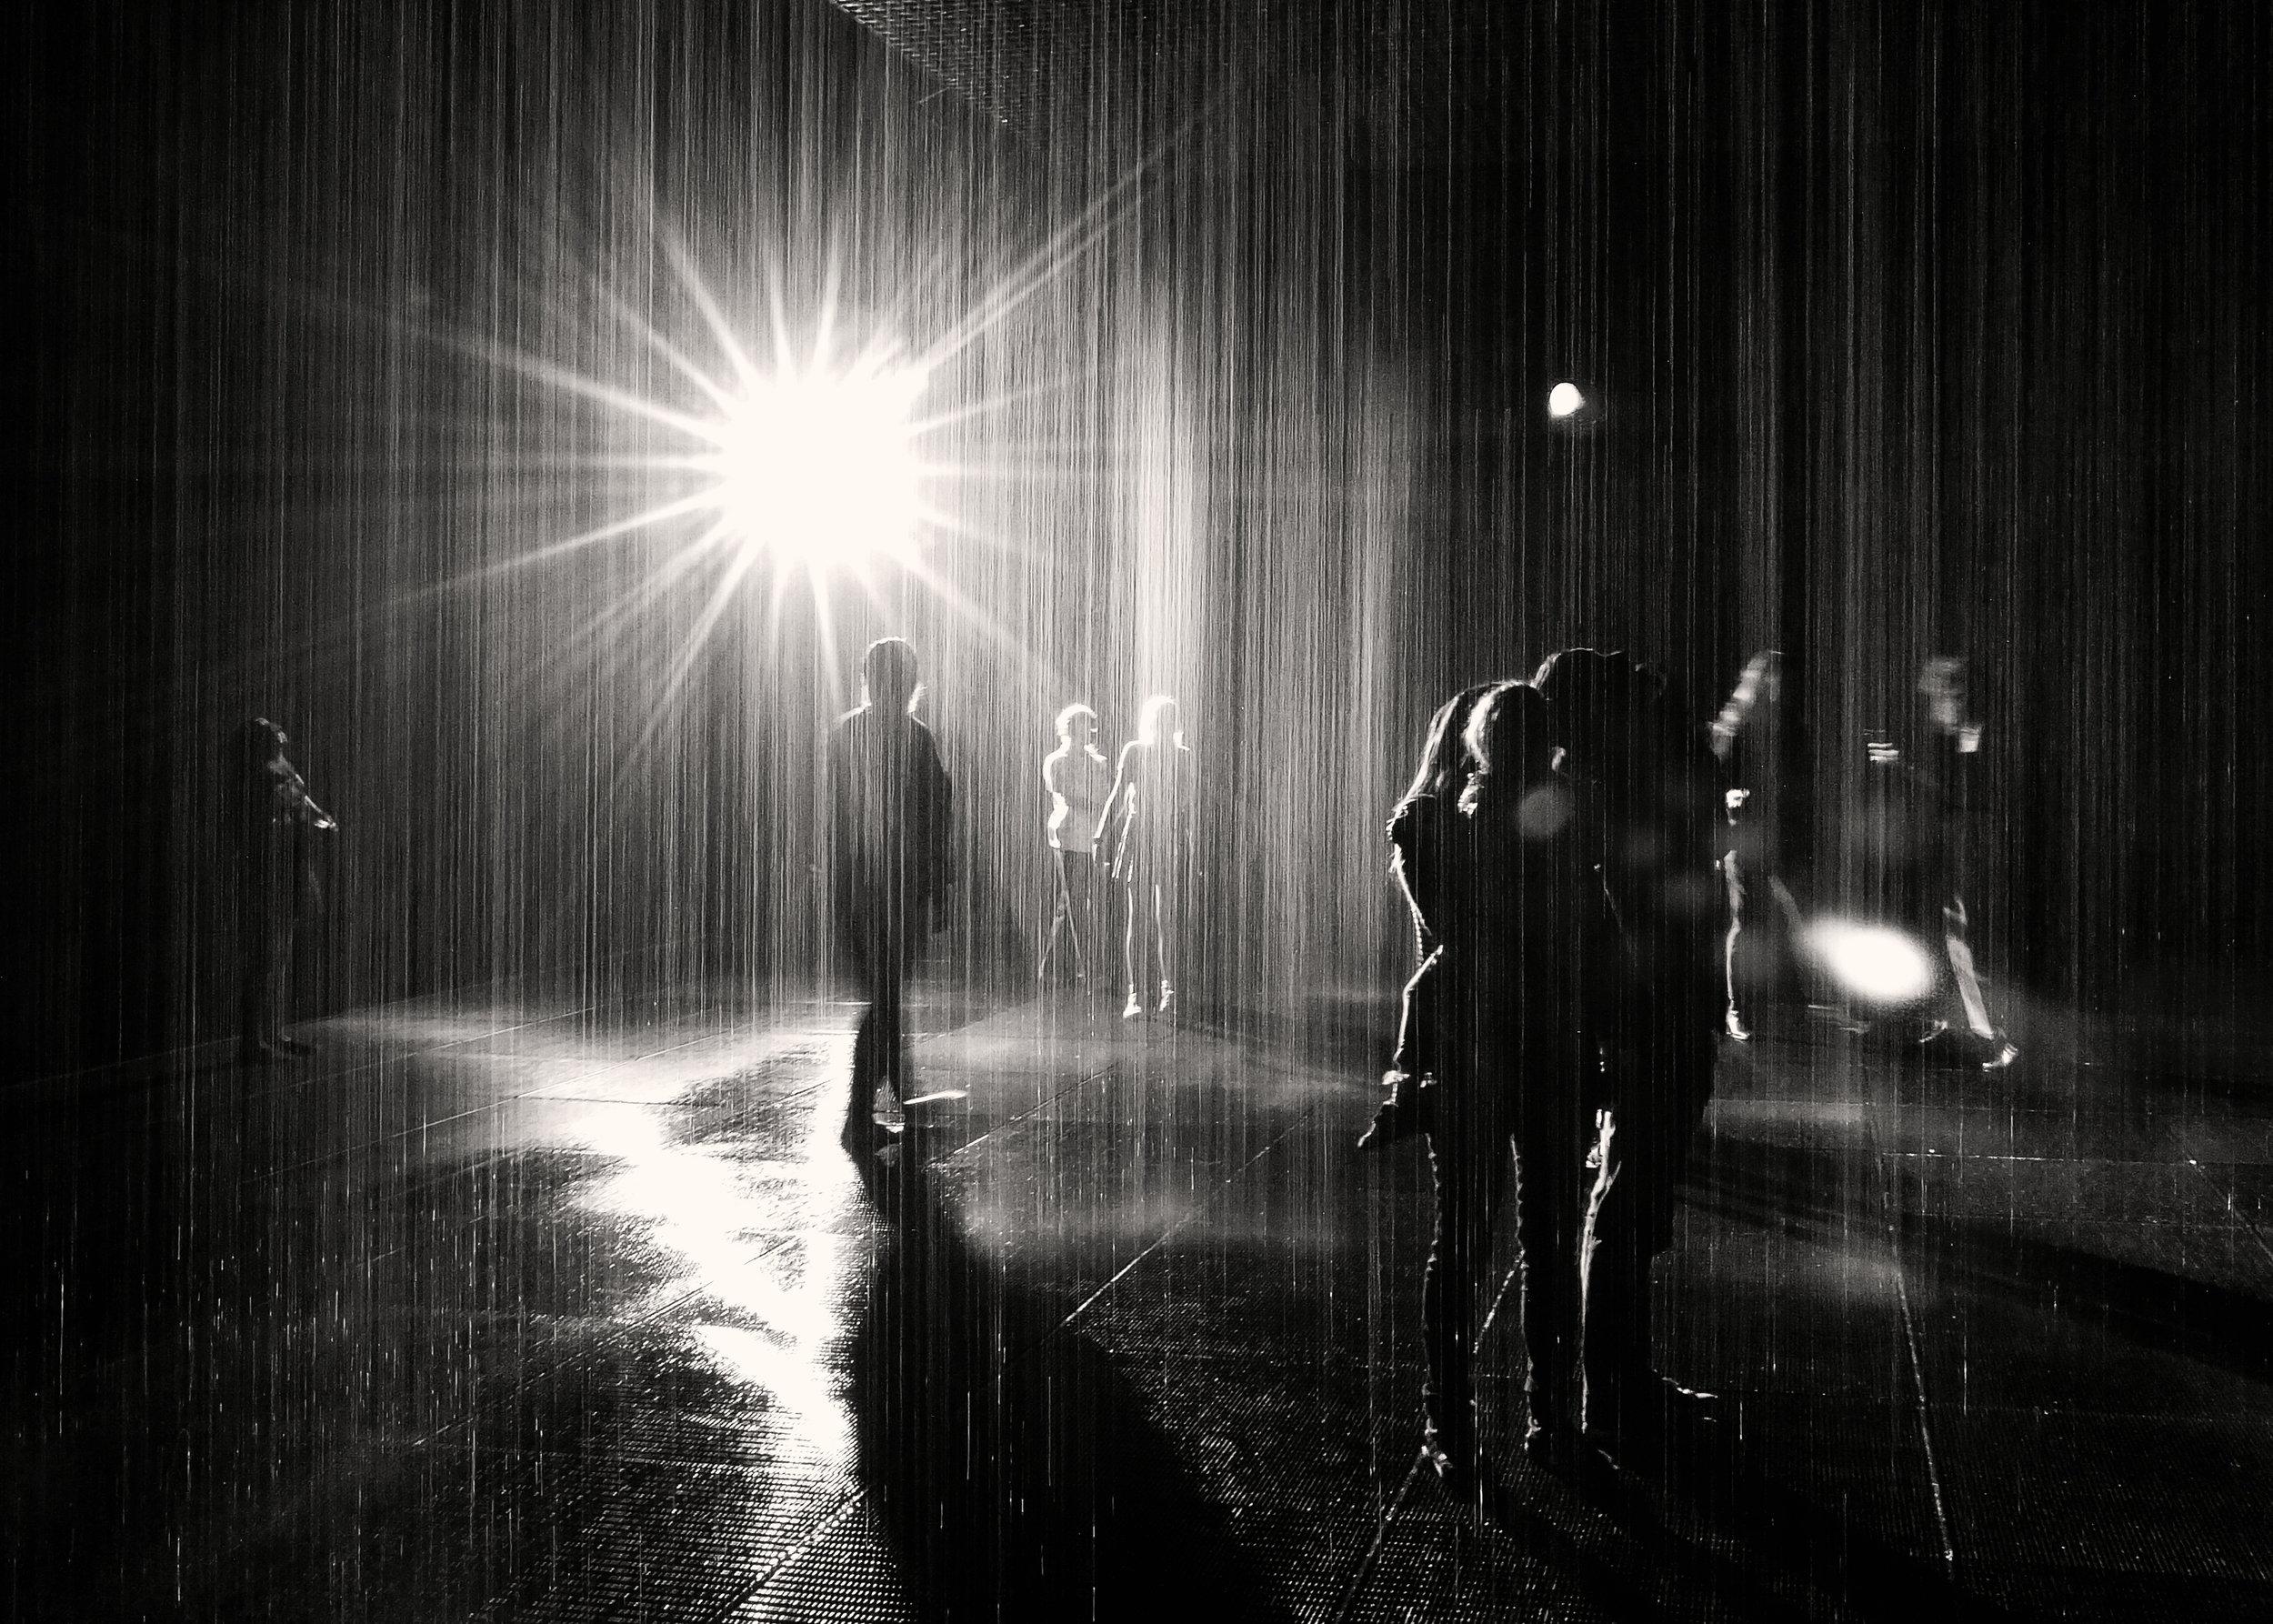 rainroom cBW.jpg